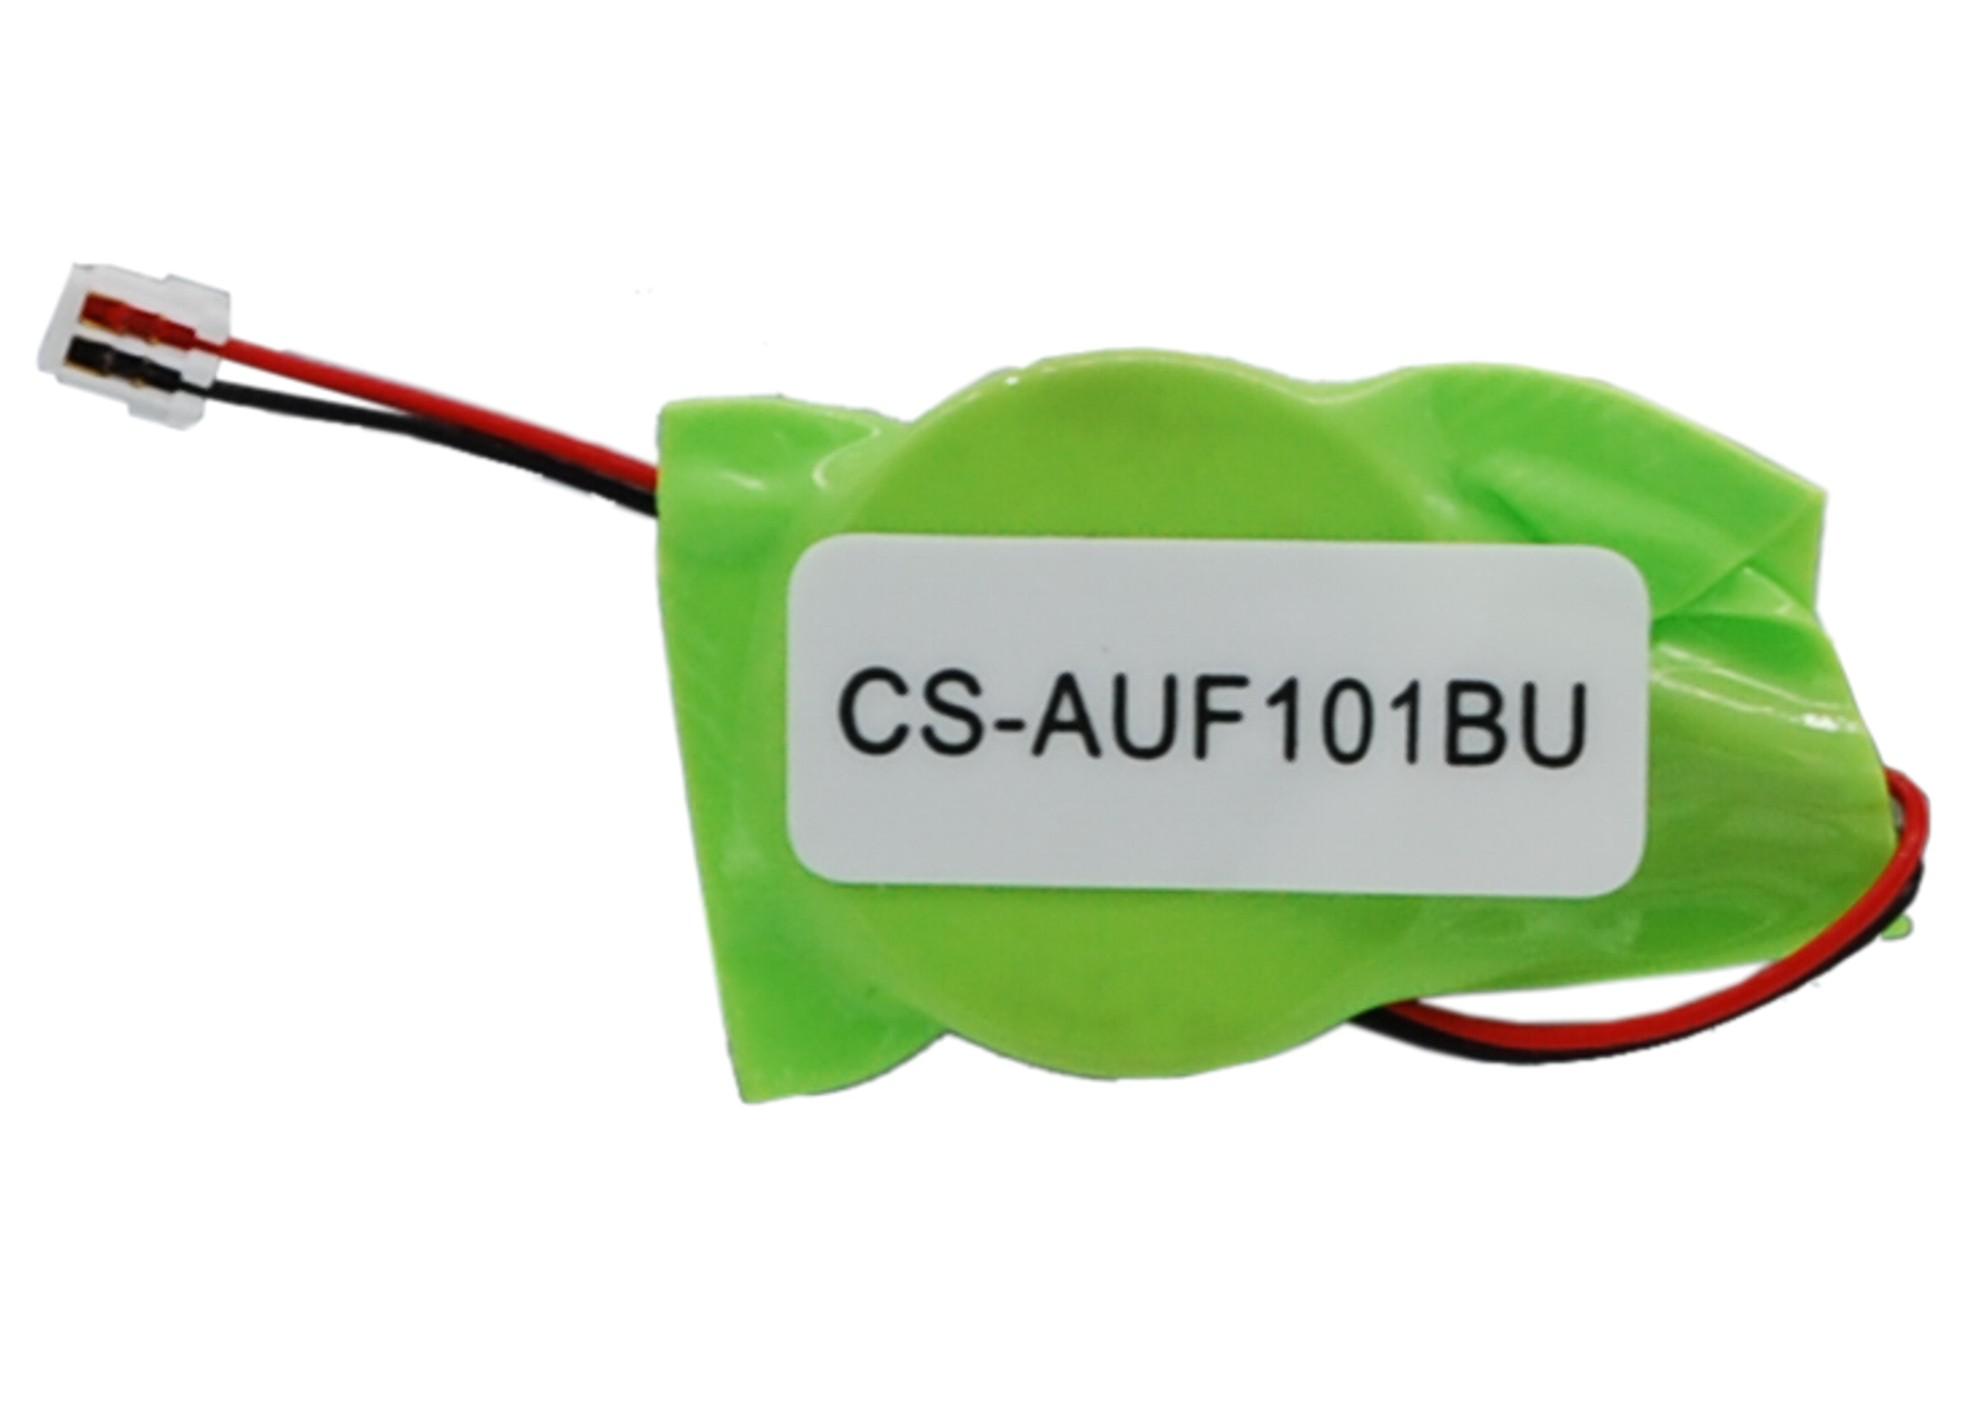 Cameron Sino baterie cmos pro ASUS Eee Pad Transformer TF101-1B017A 3V Li-ion 40mAh zelená - neoriginální